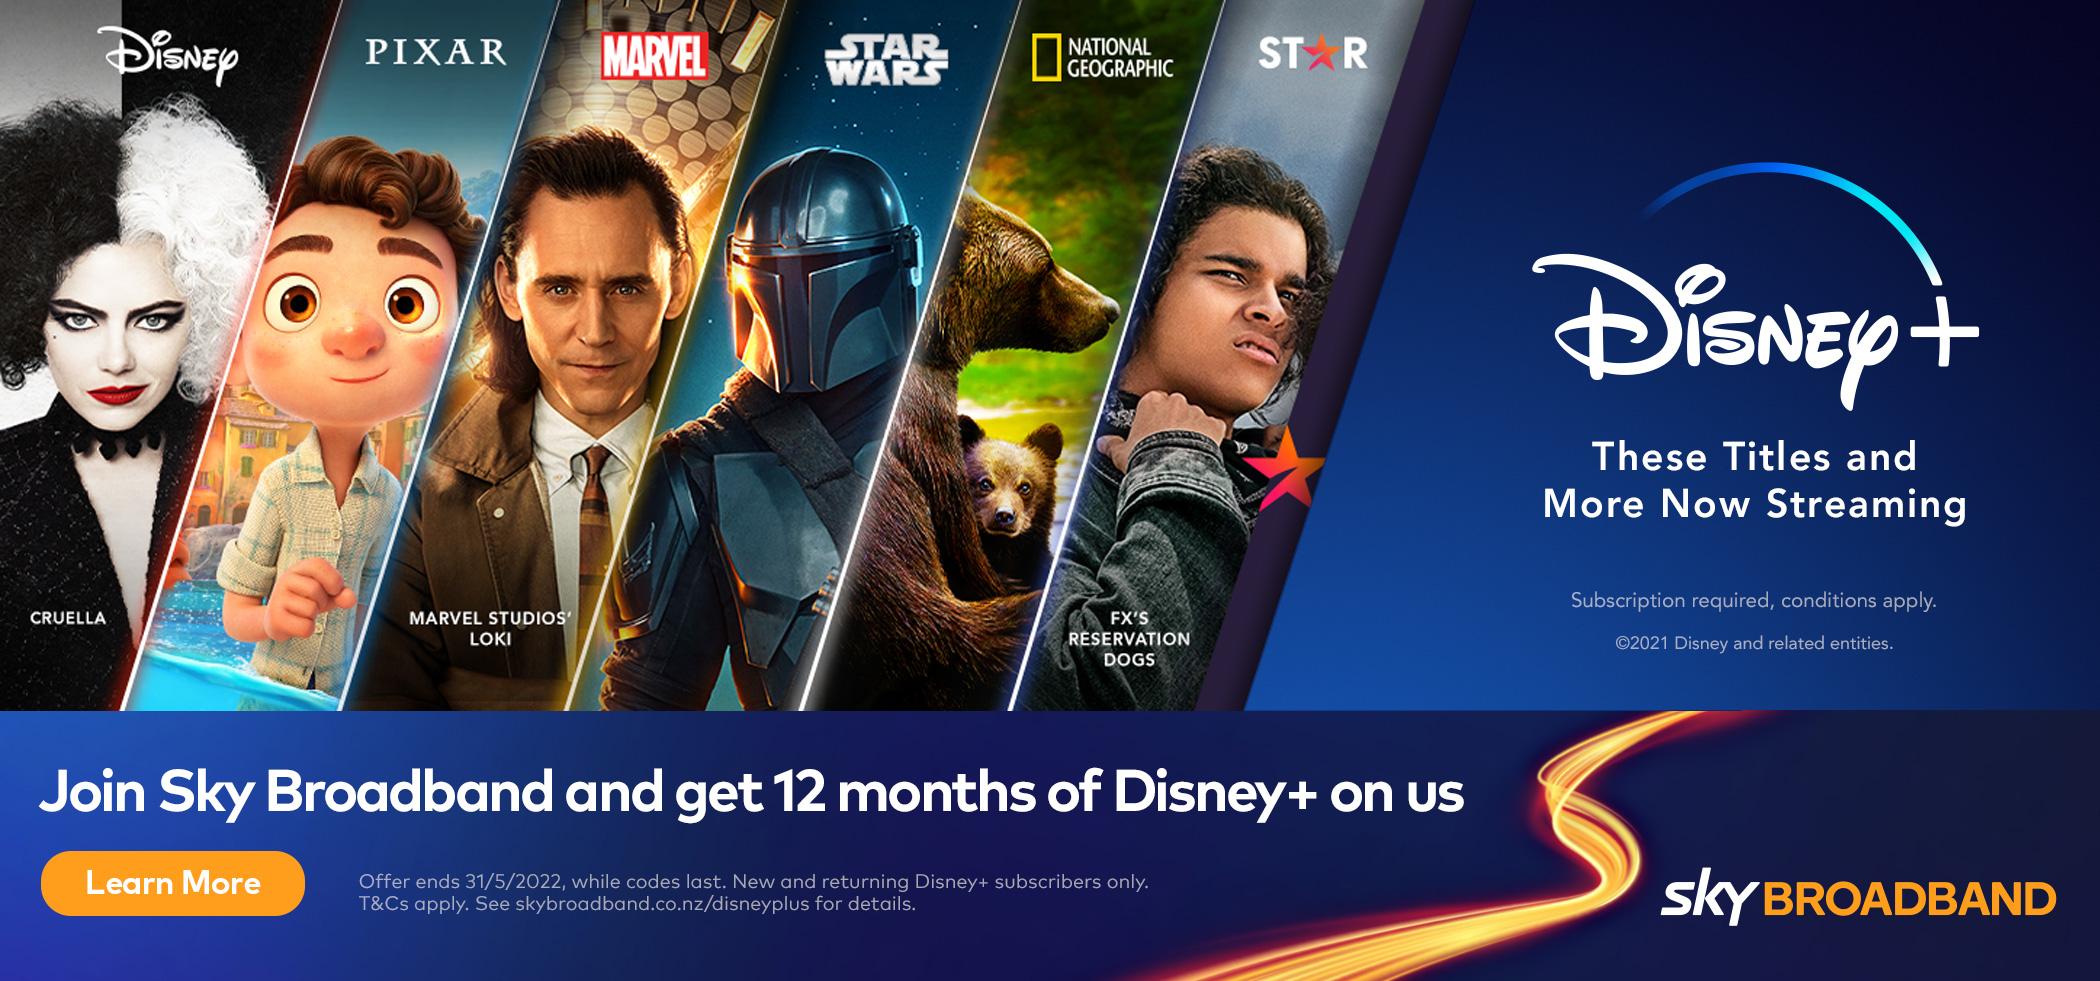 Sky Broadband - Disney+ offer